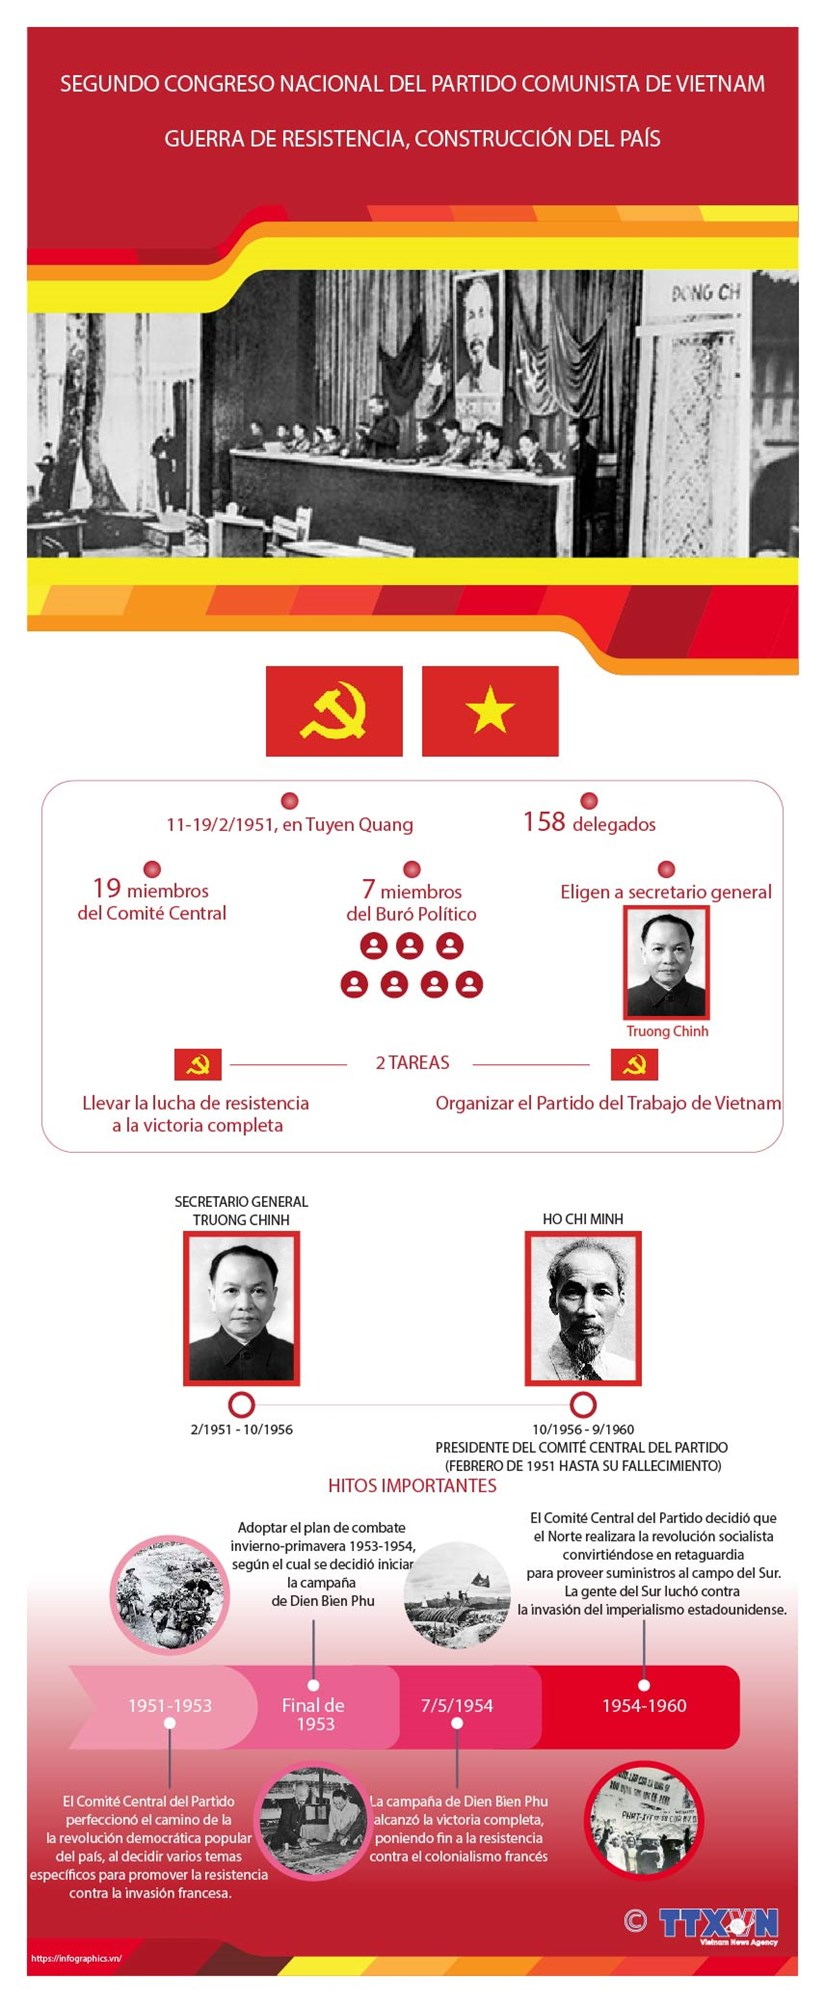 Segundo Congreso Nacional del Partido Comunista de Vietnam: Guerra de resistencia, construccion del pais hinh anh 1